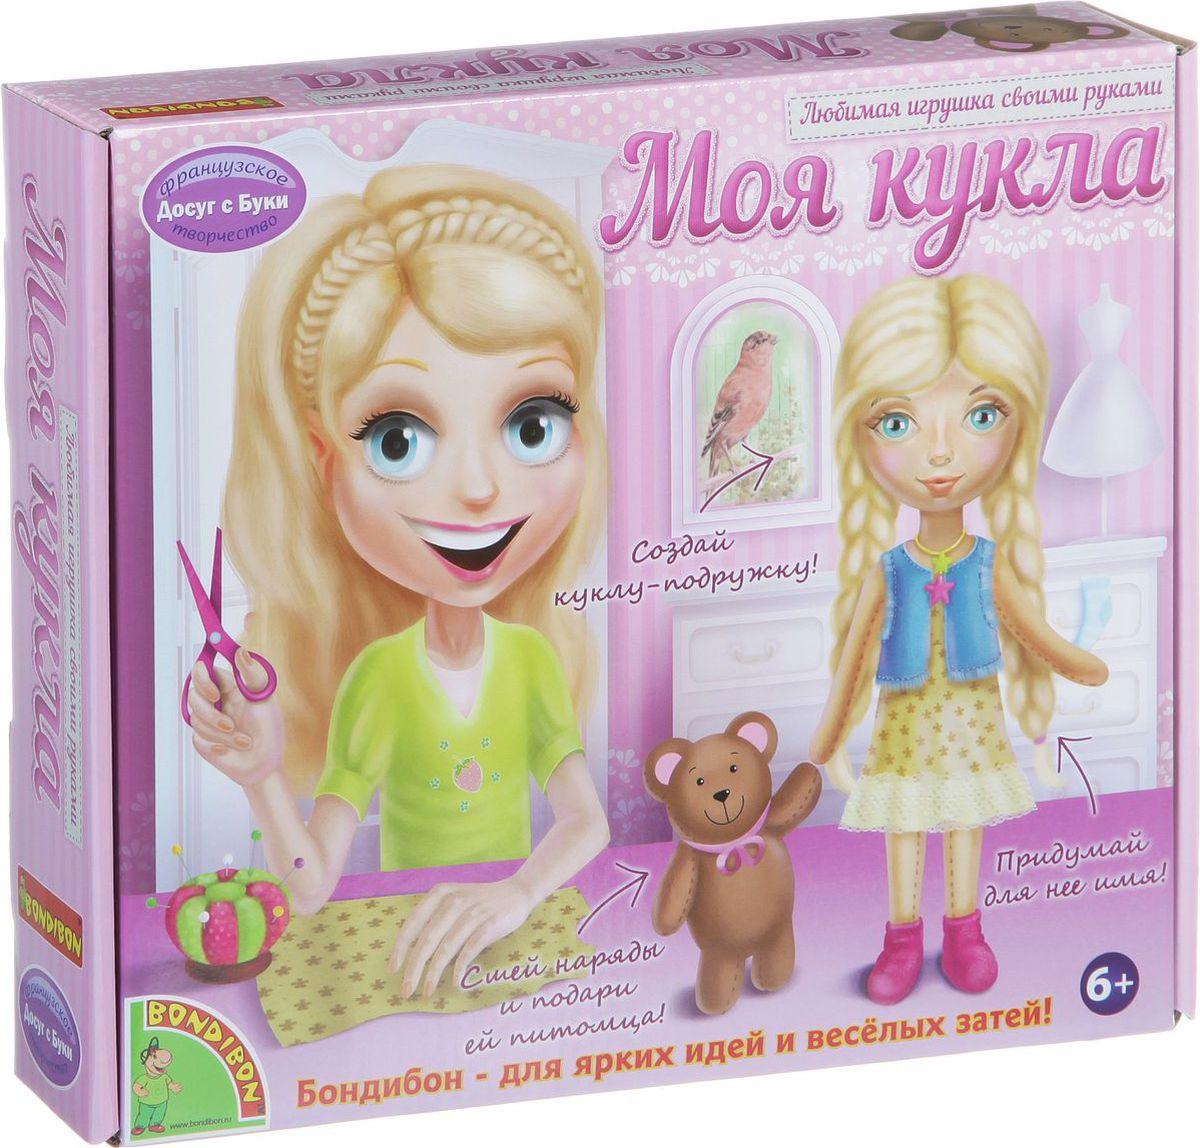 Bondibon Набор для шитья Моя кукла блондинка